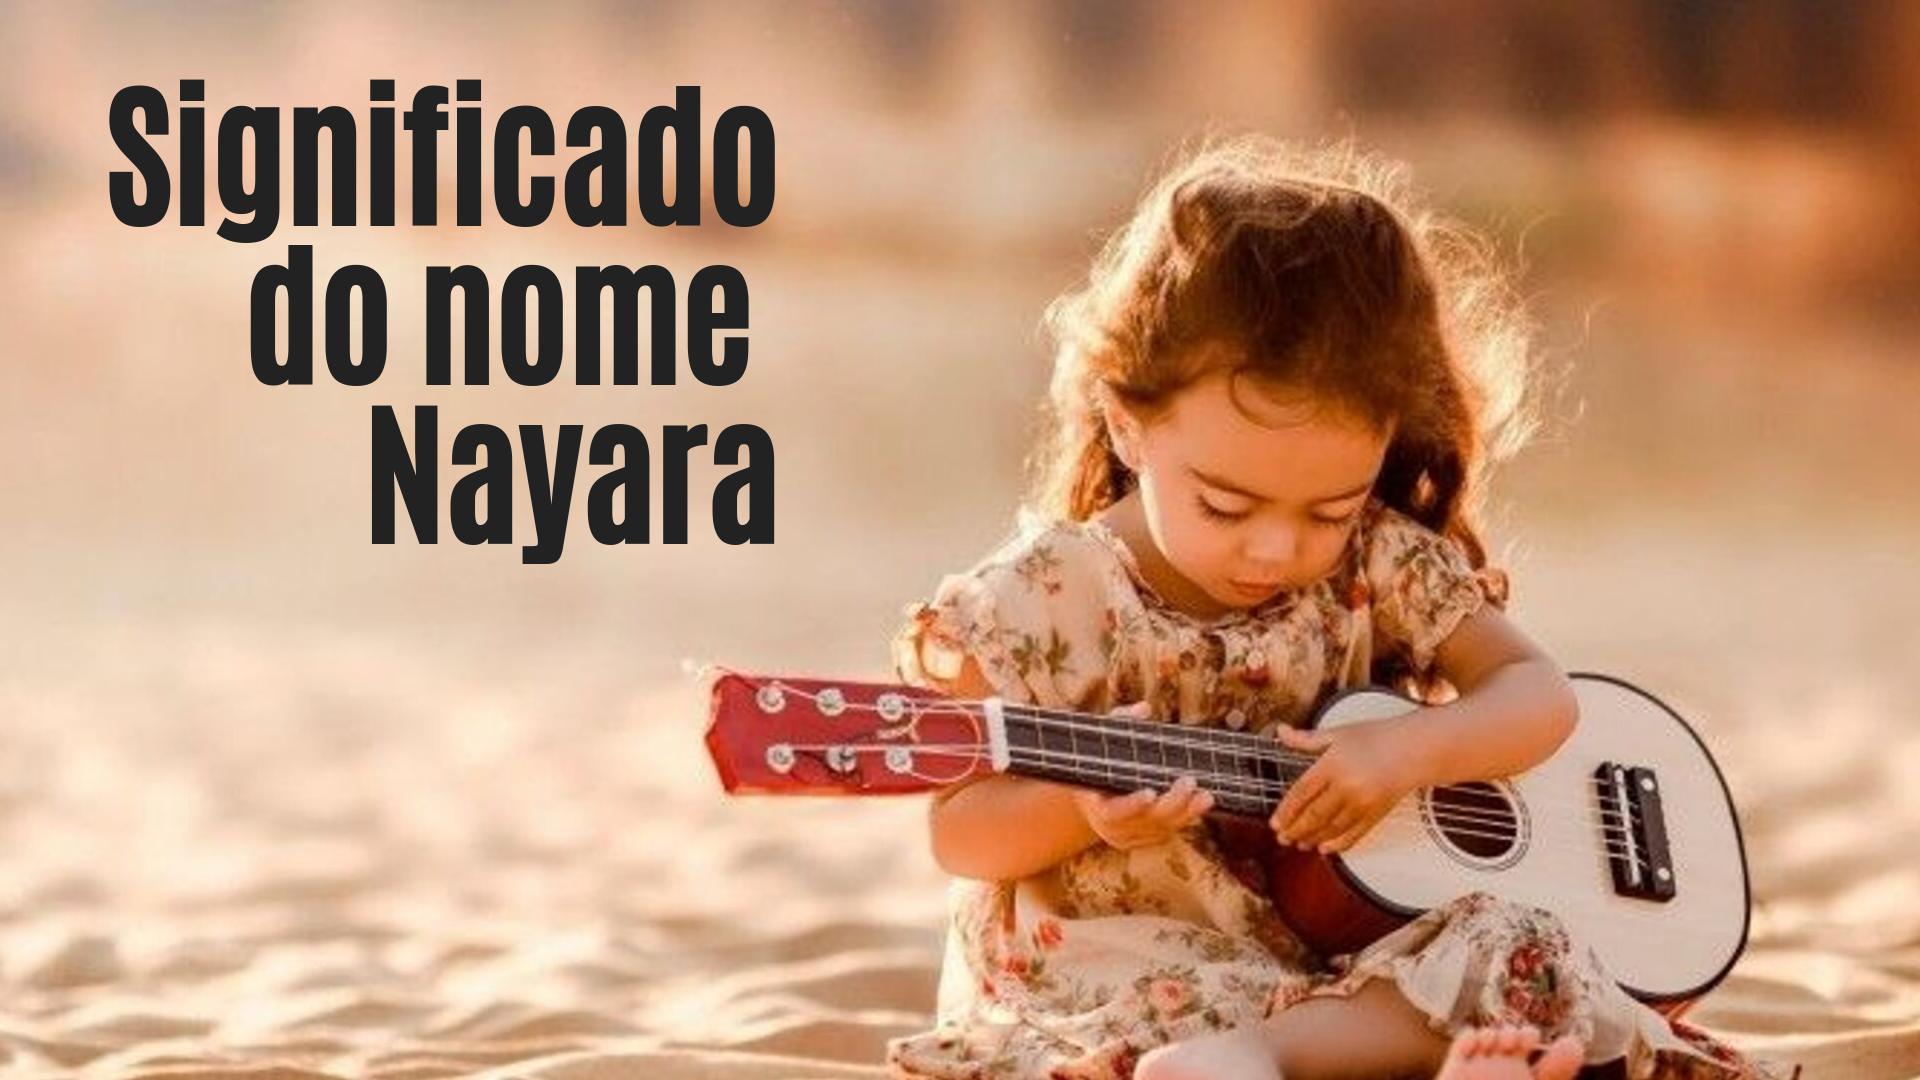 foto escrita significado do nome Nayara